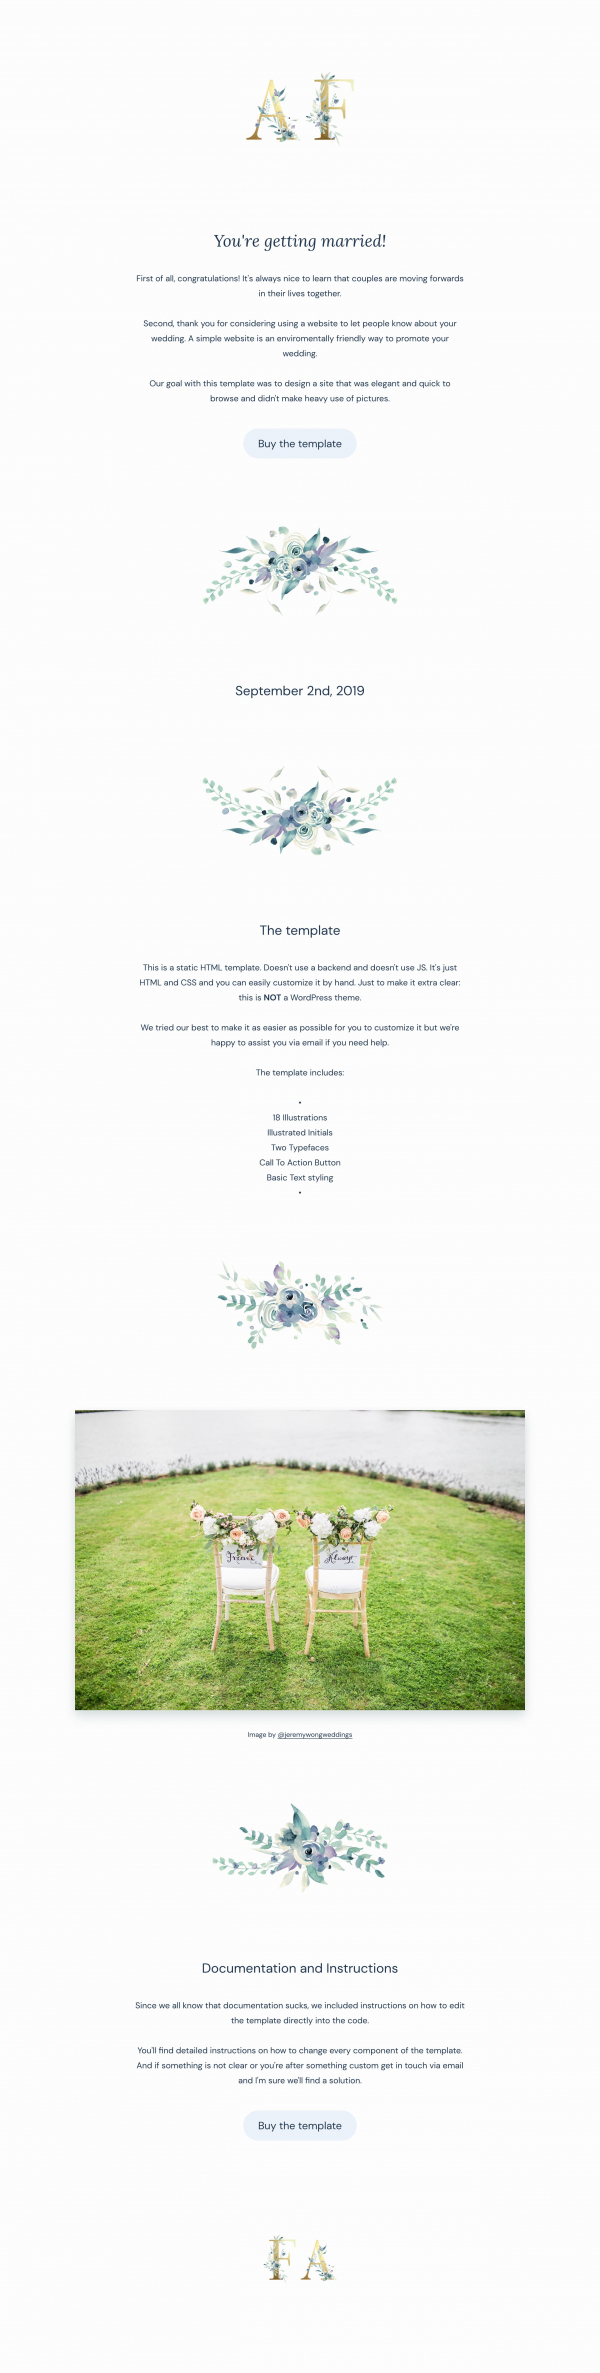 Website Inspiration: Congratulations